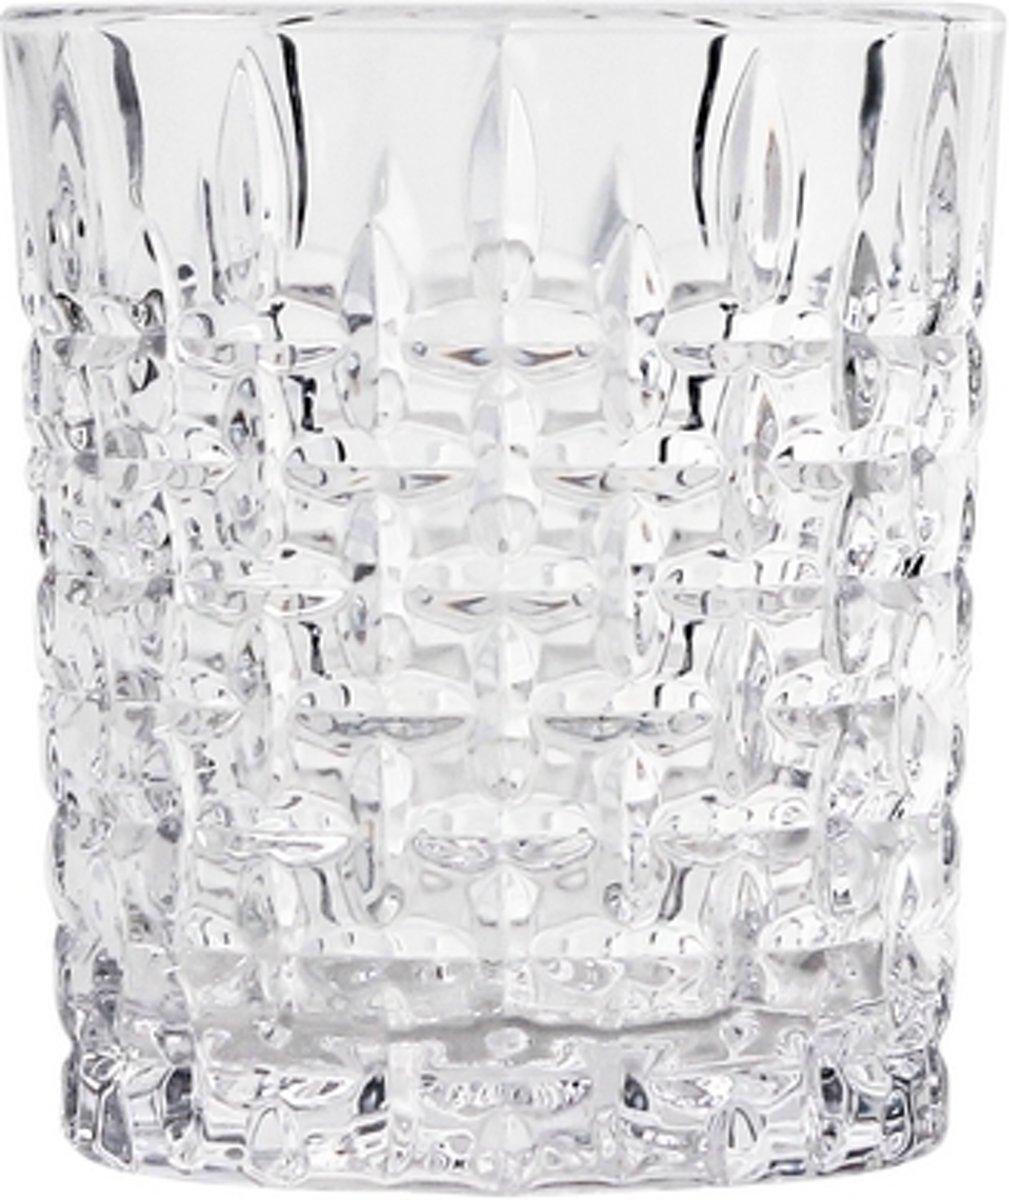 Montreal whisky glazen 30cl - 6 stuks kopen